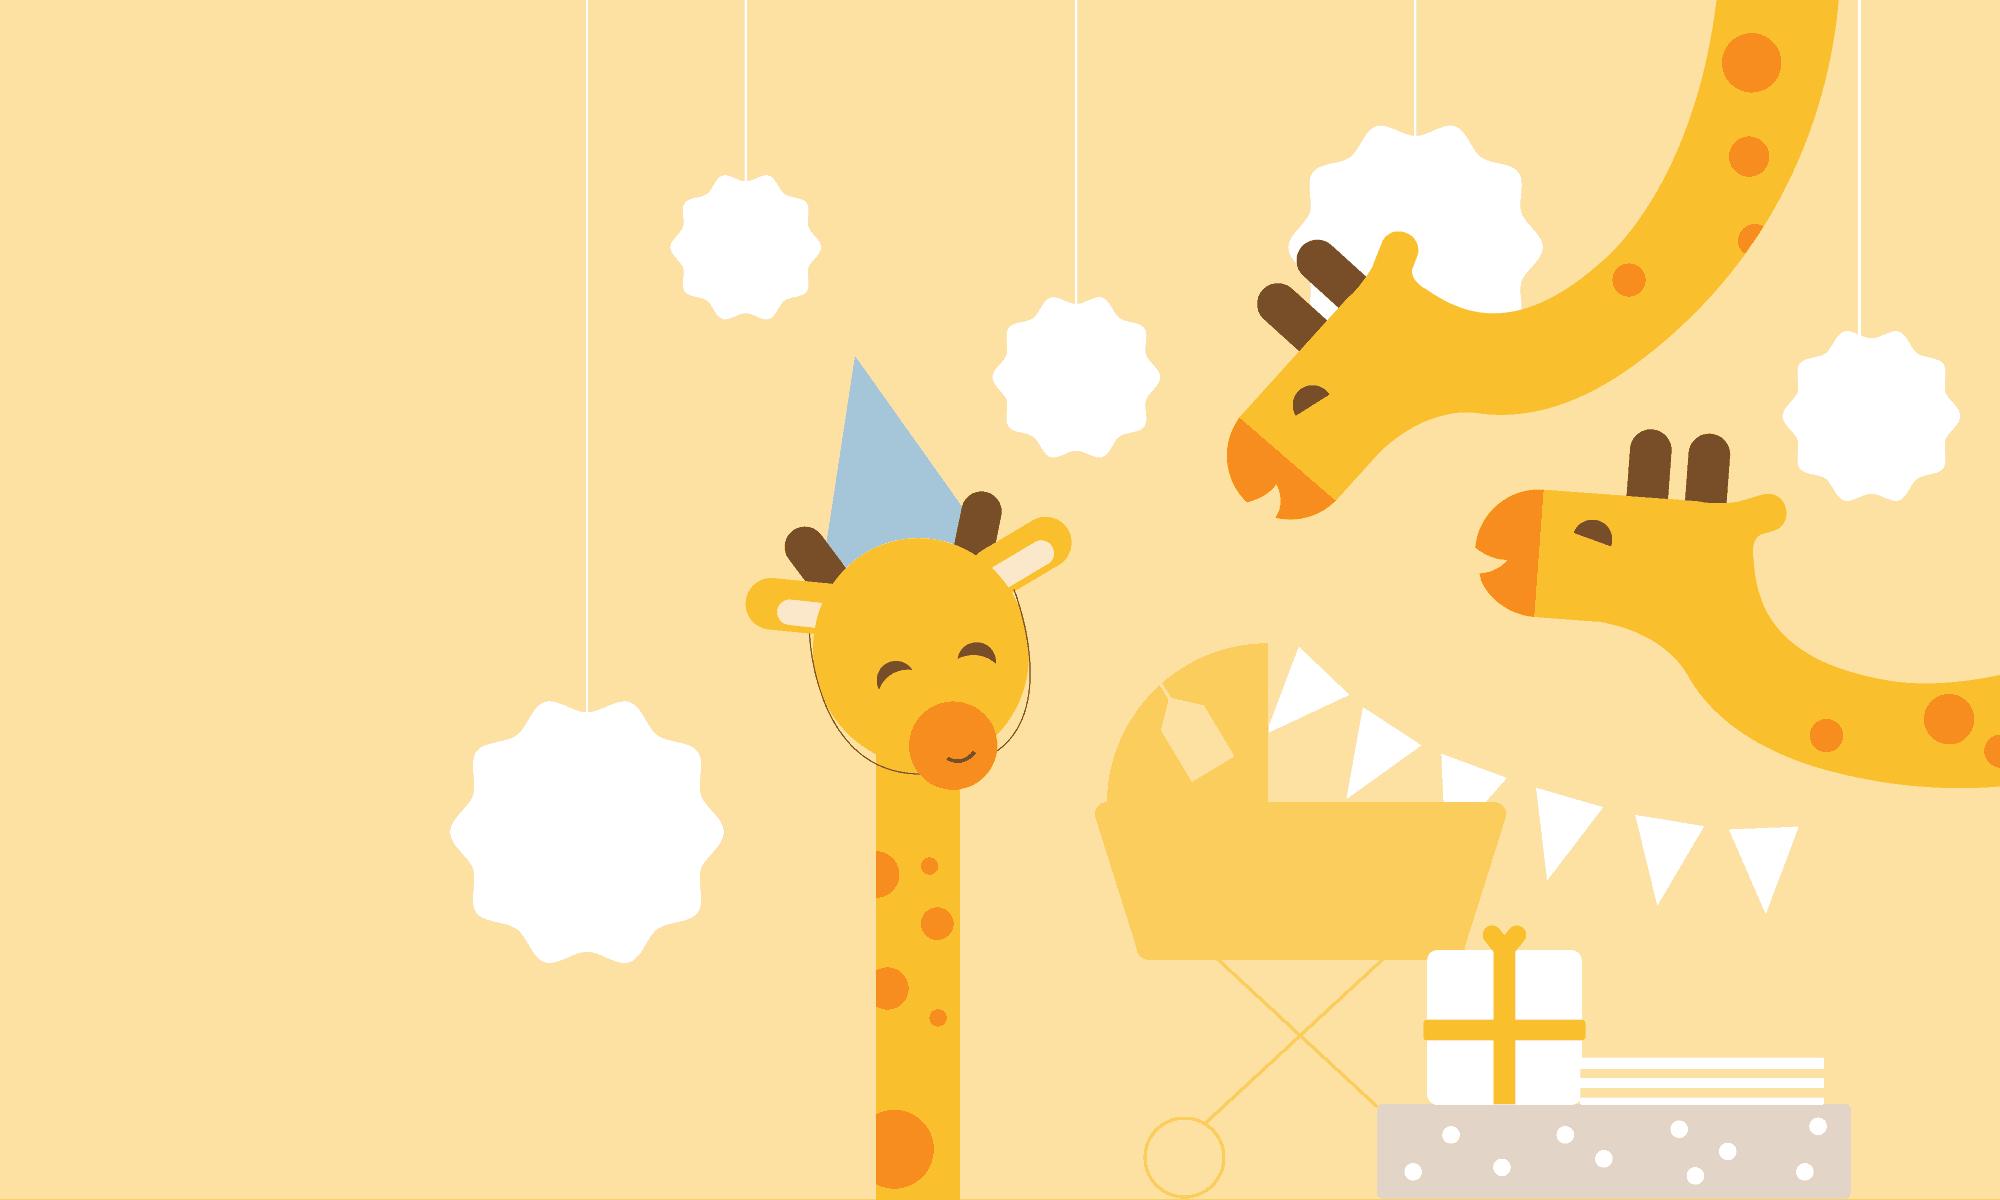 wbs hd giraffe yellow 2000 | baby shower online planner | WebBabyShower